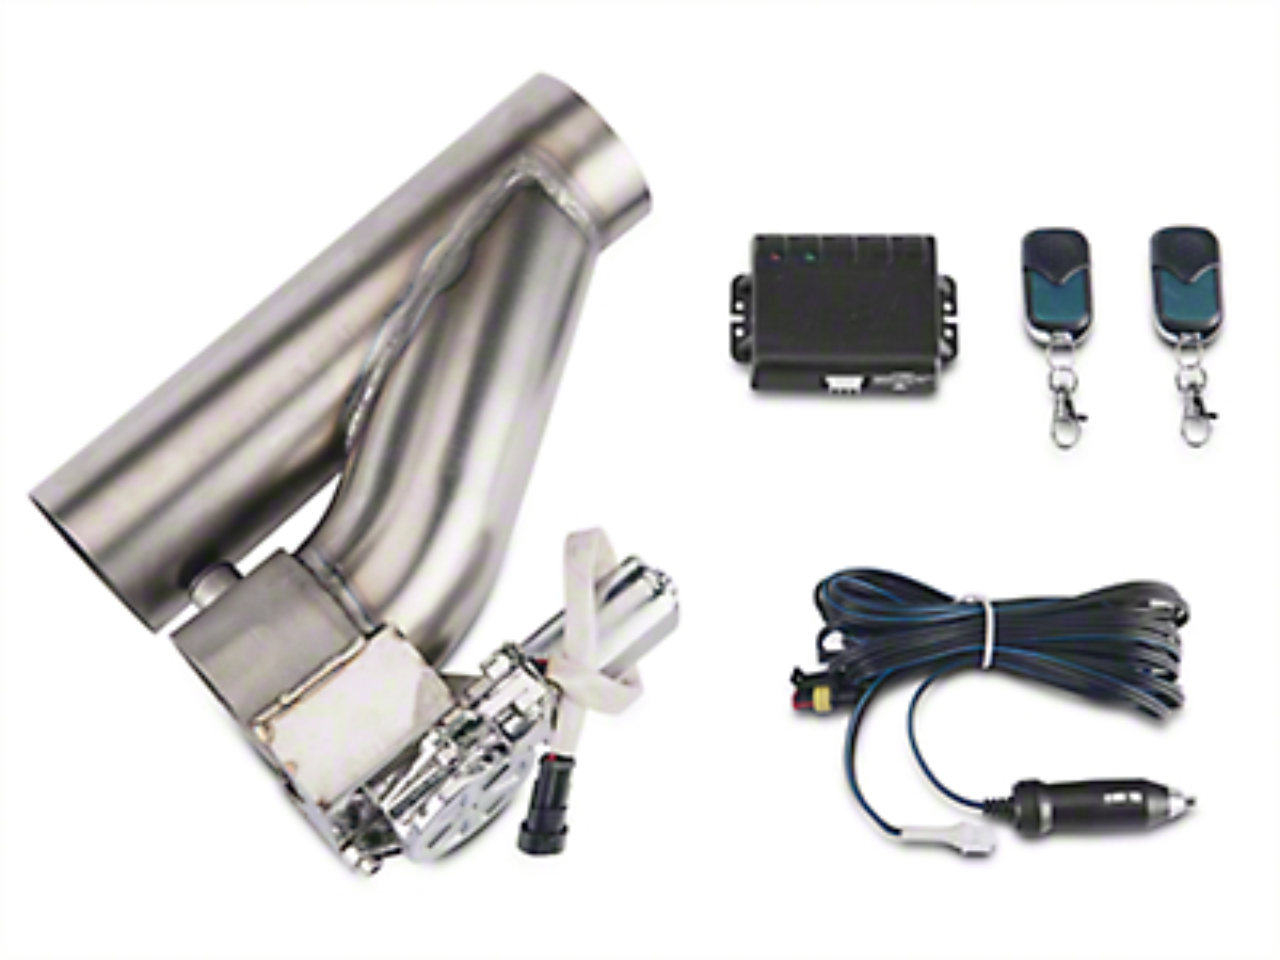 X-Force Electronic Exhaust Cutout Kit - 3 in. (87-18 Jeep Wrangler YJ, TJ, JK & JL)